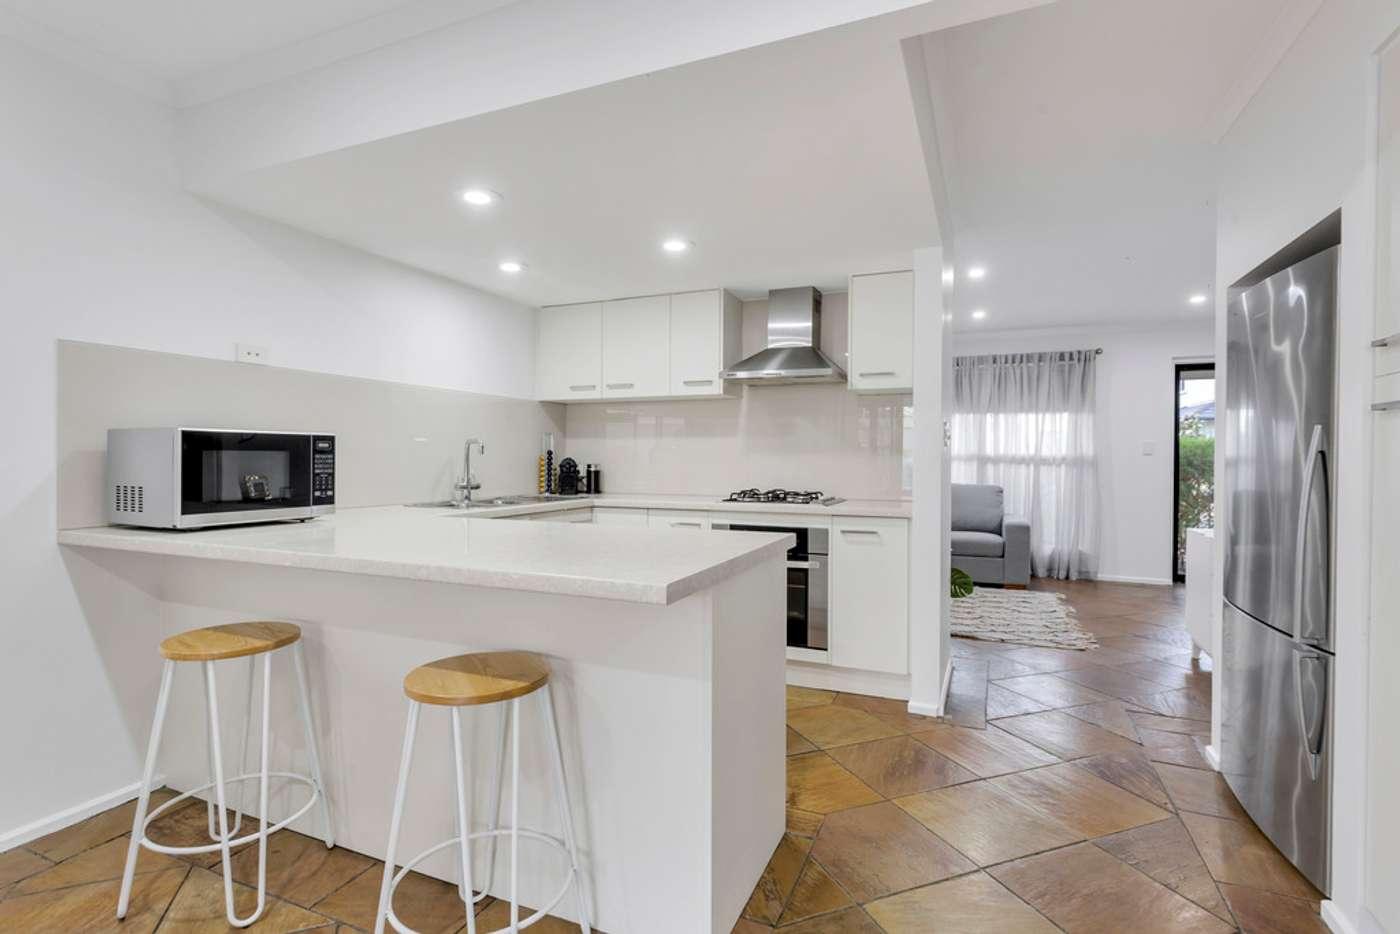 Sixth view of Homely house listing, 15 Blight Street, Ridleyton SA 5008